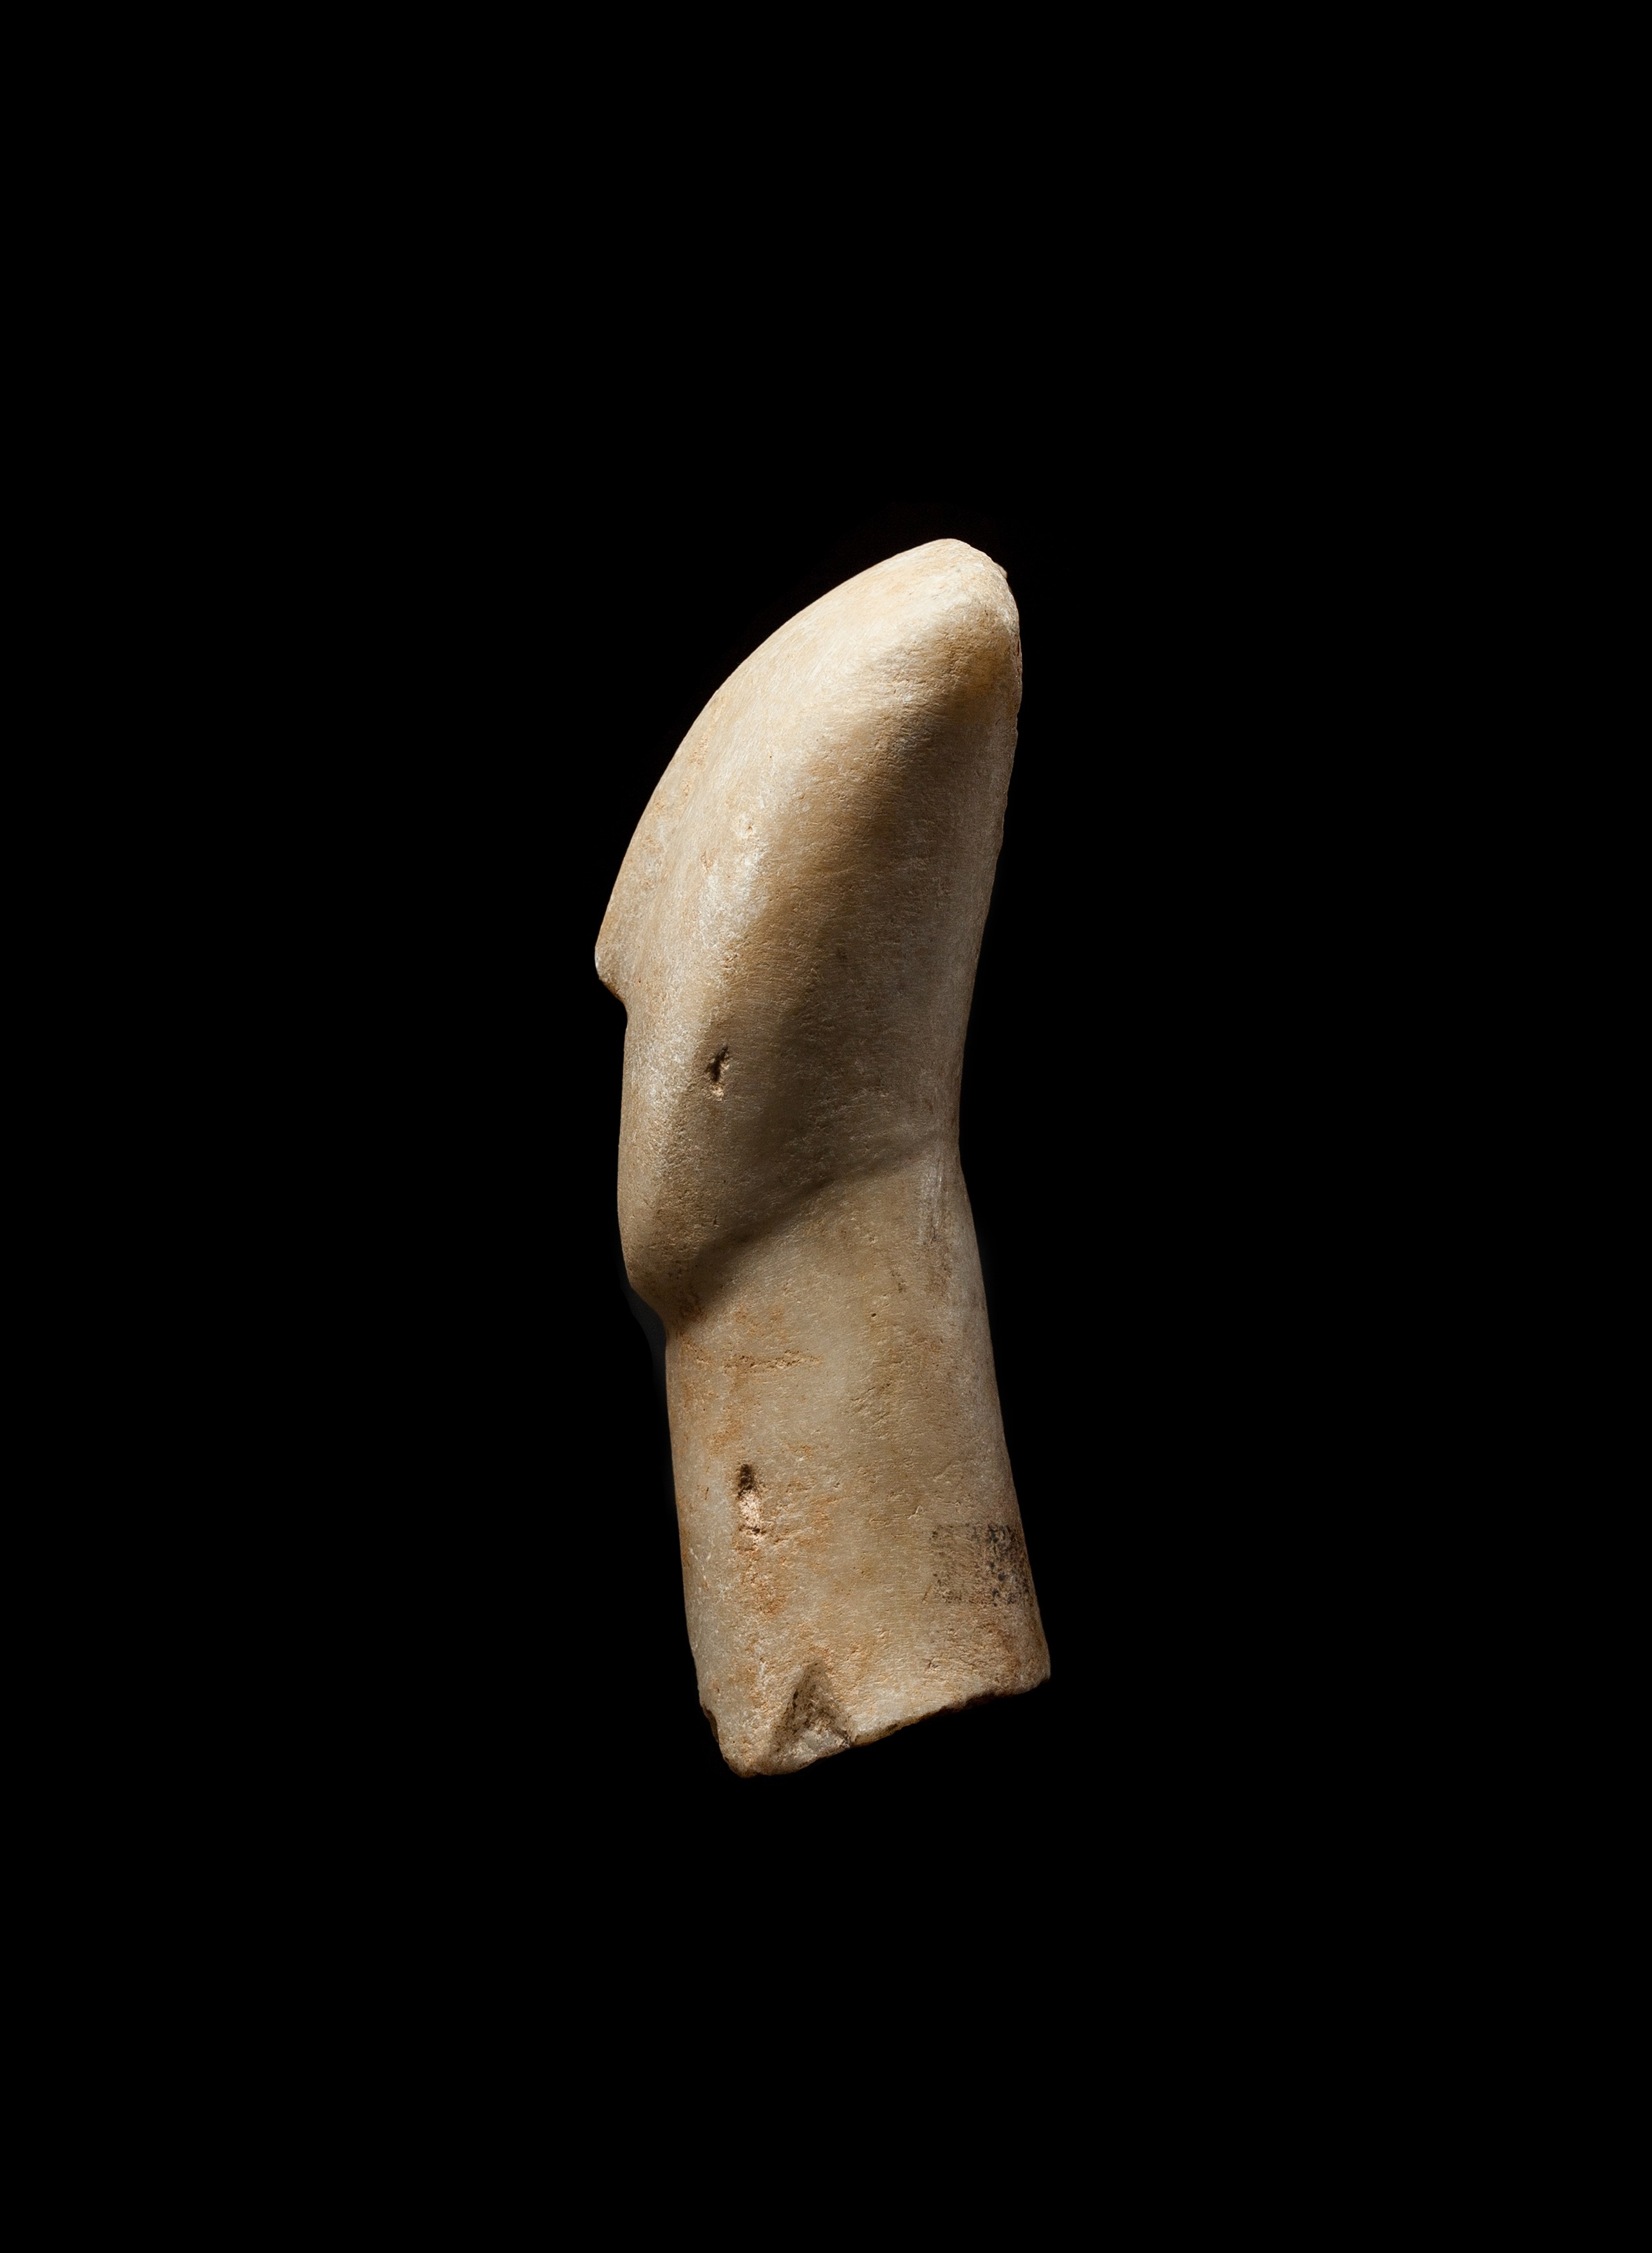 CYCLADIC IDOL HEAD CYCLADES, EARLY CYCLADIC II, C. 2600 - 2400 B.C. - Image 5 of 6